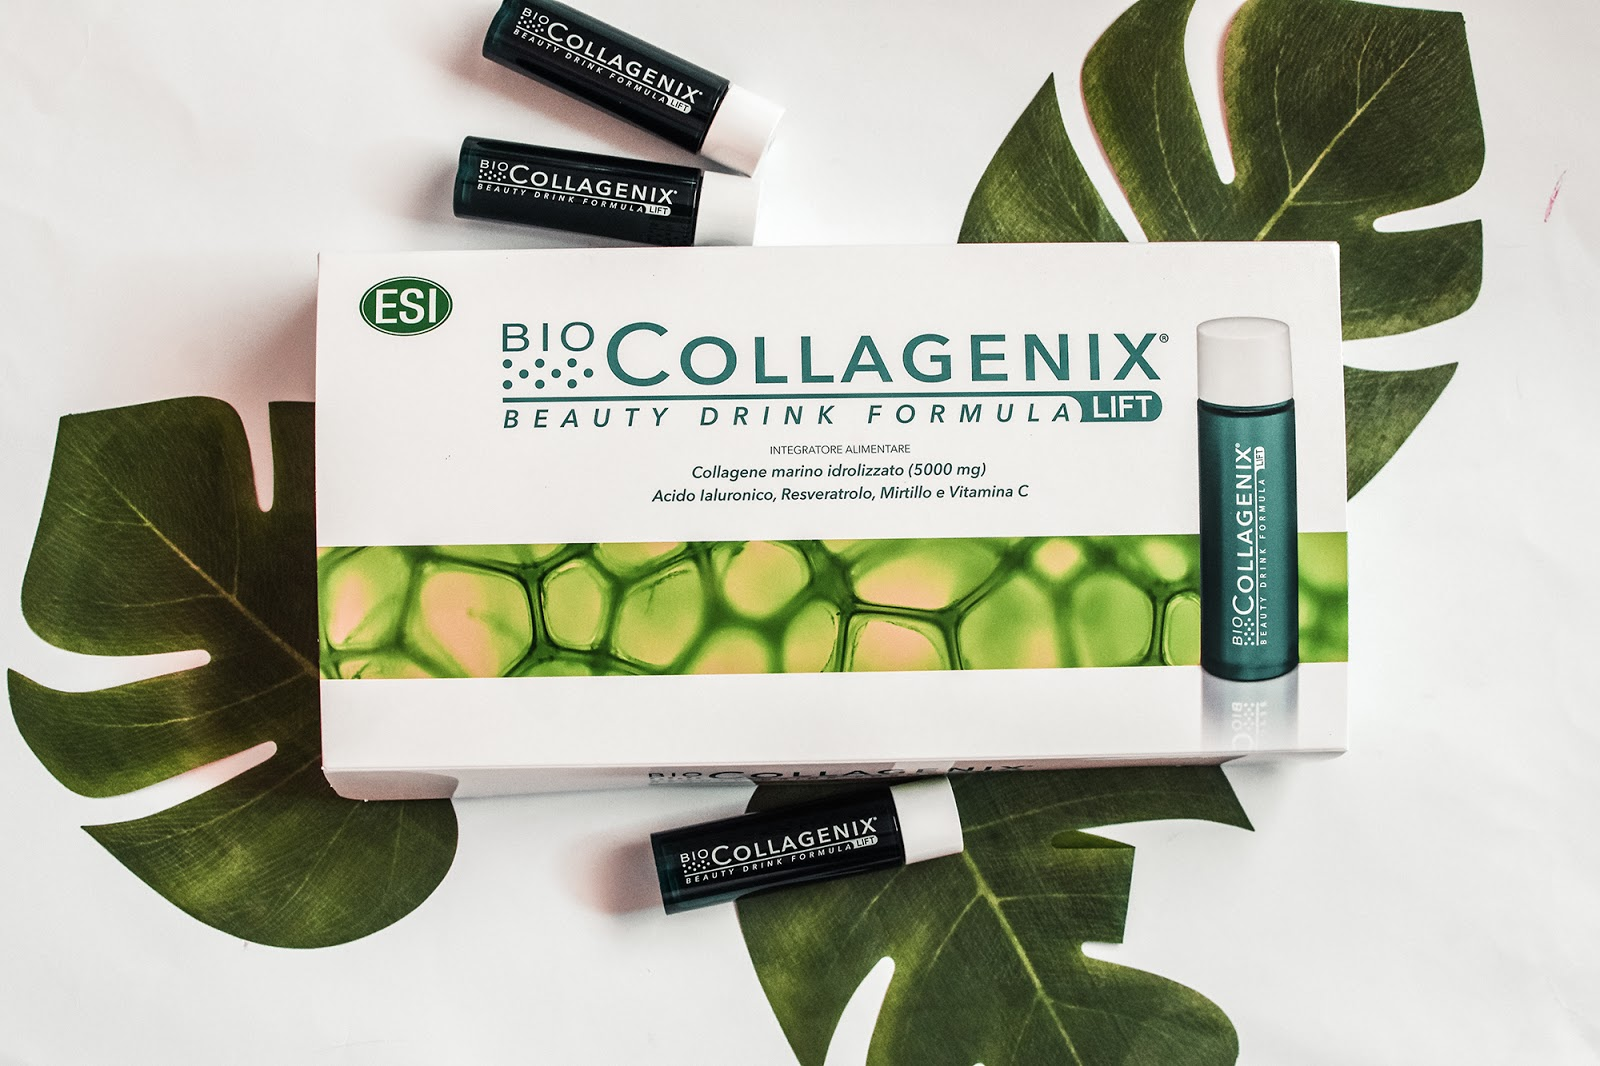 biocollagenix